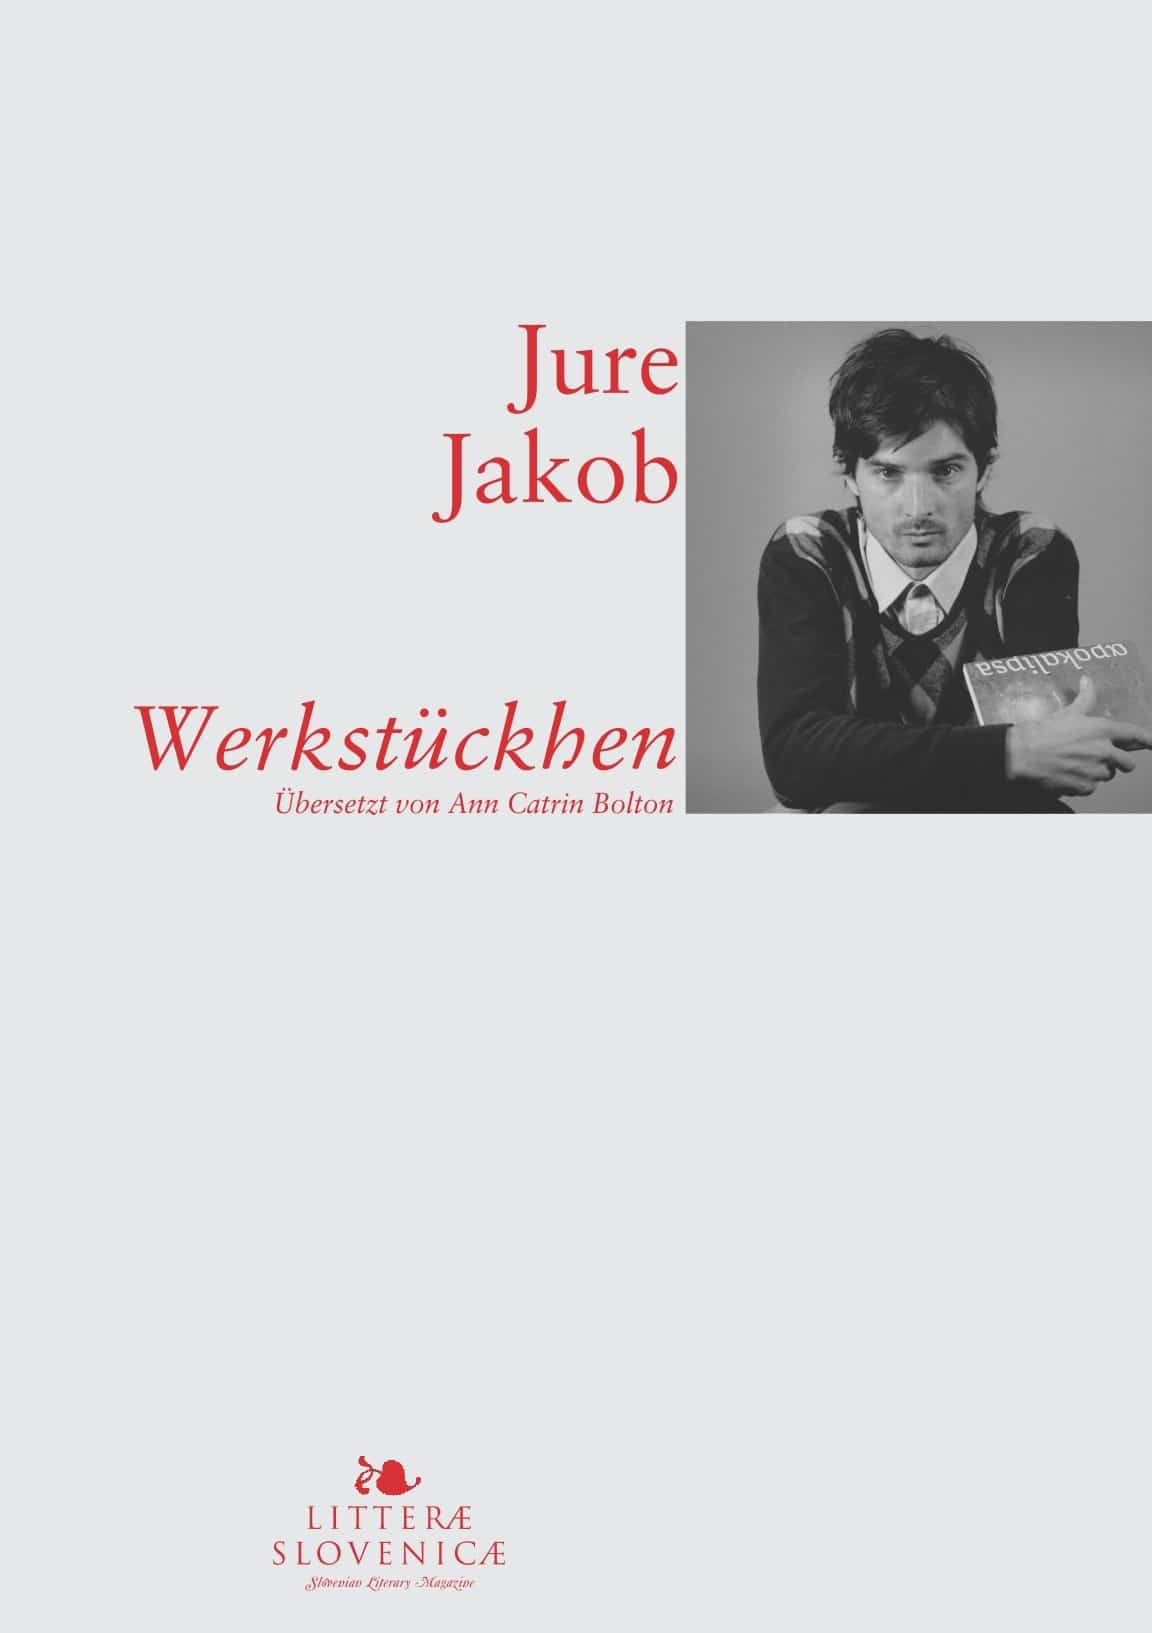 nasl-jakob_portrait-1.jpg